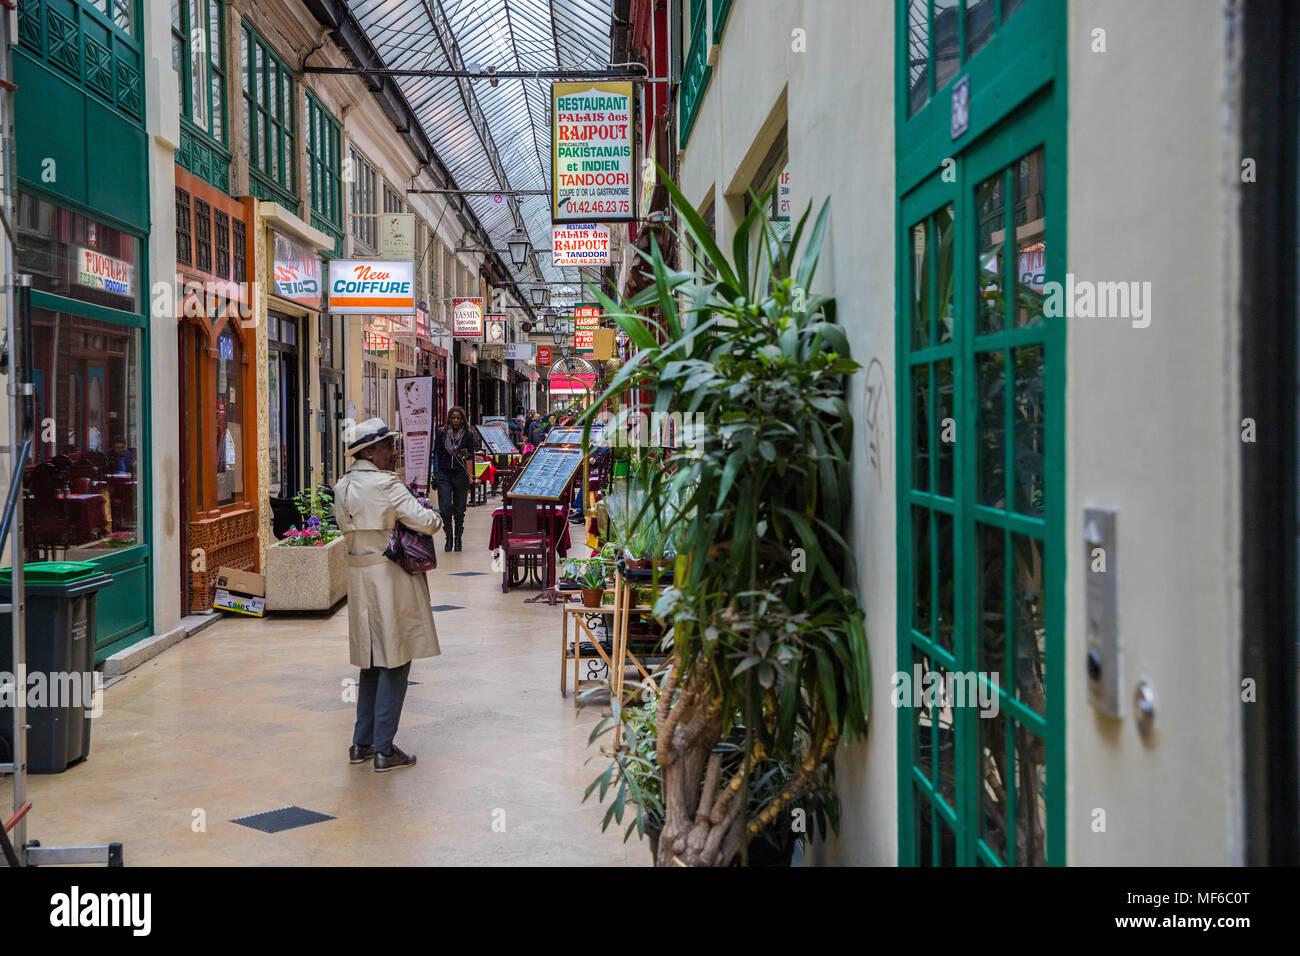 Passage Brady, passage couvert, passage couvert, indienne, Paris Photo Stock